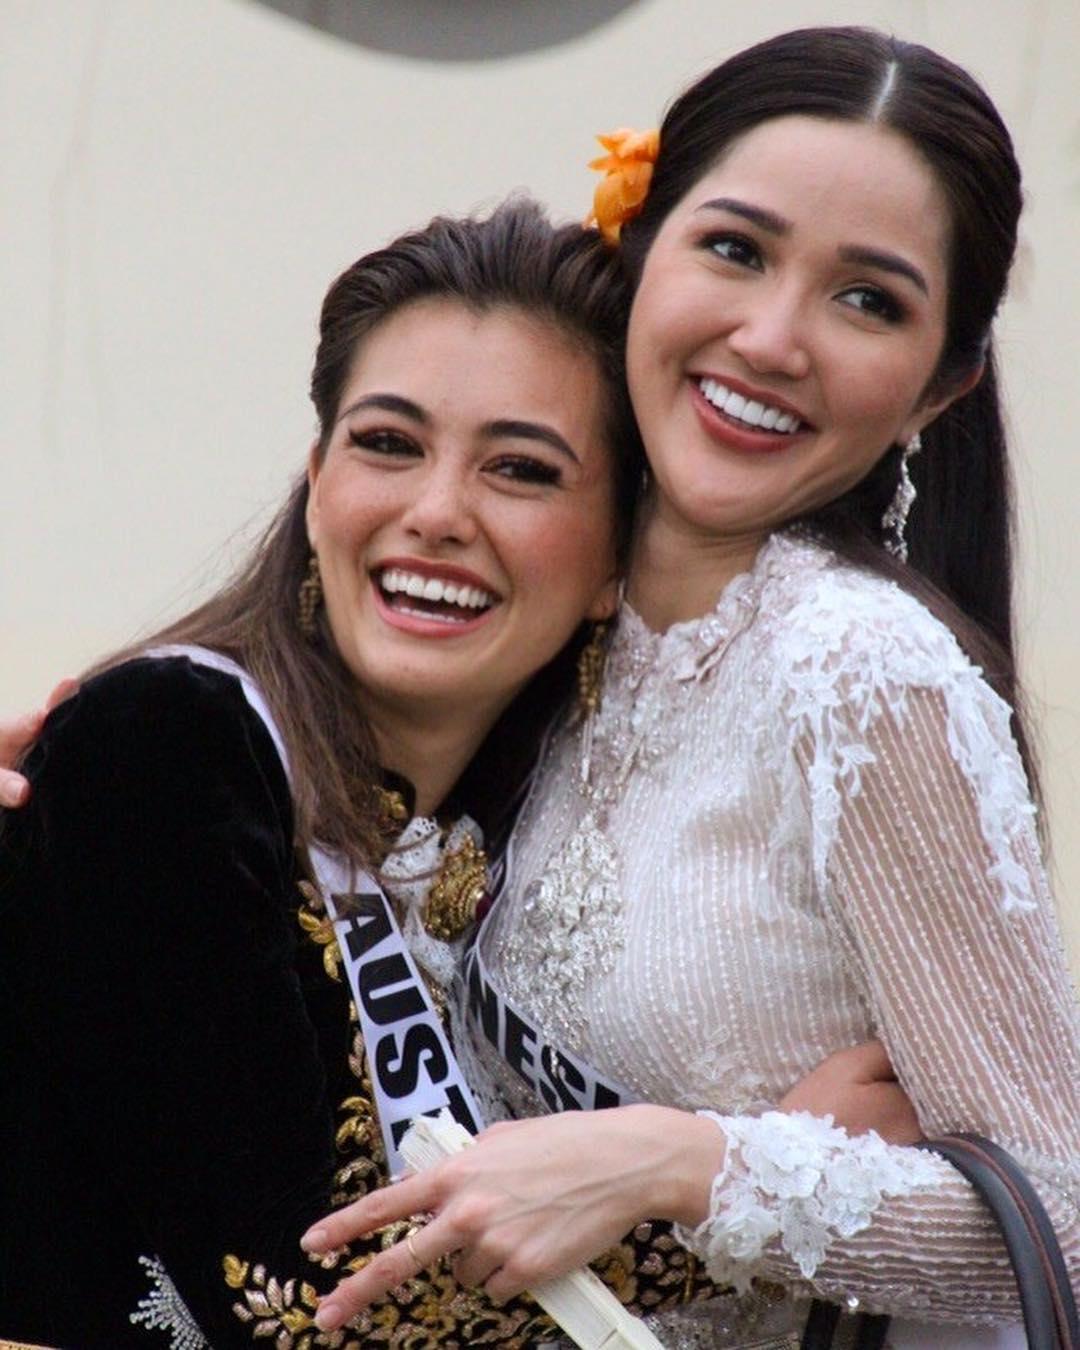 candidatas a miss universe 2018. final: 16 dec. sede: bangkok. part final. Jsemfaa7